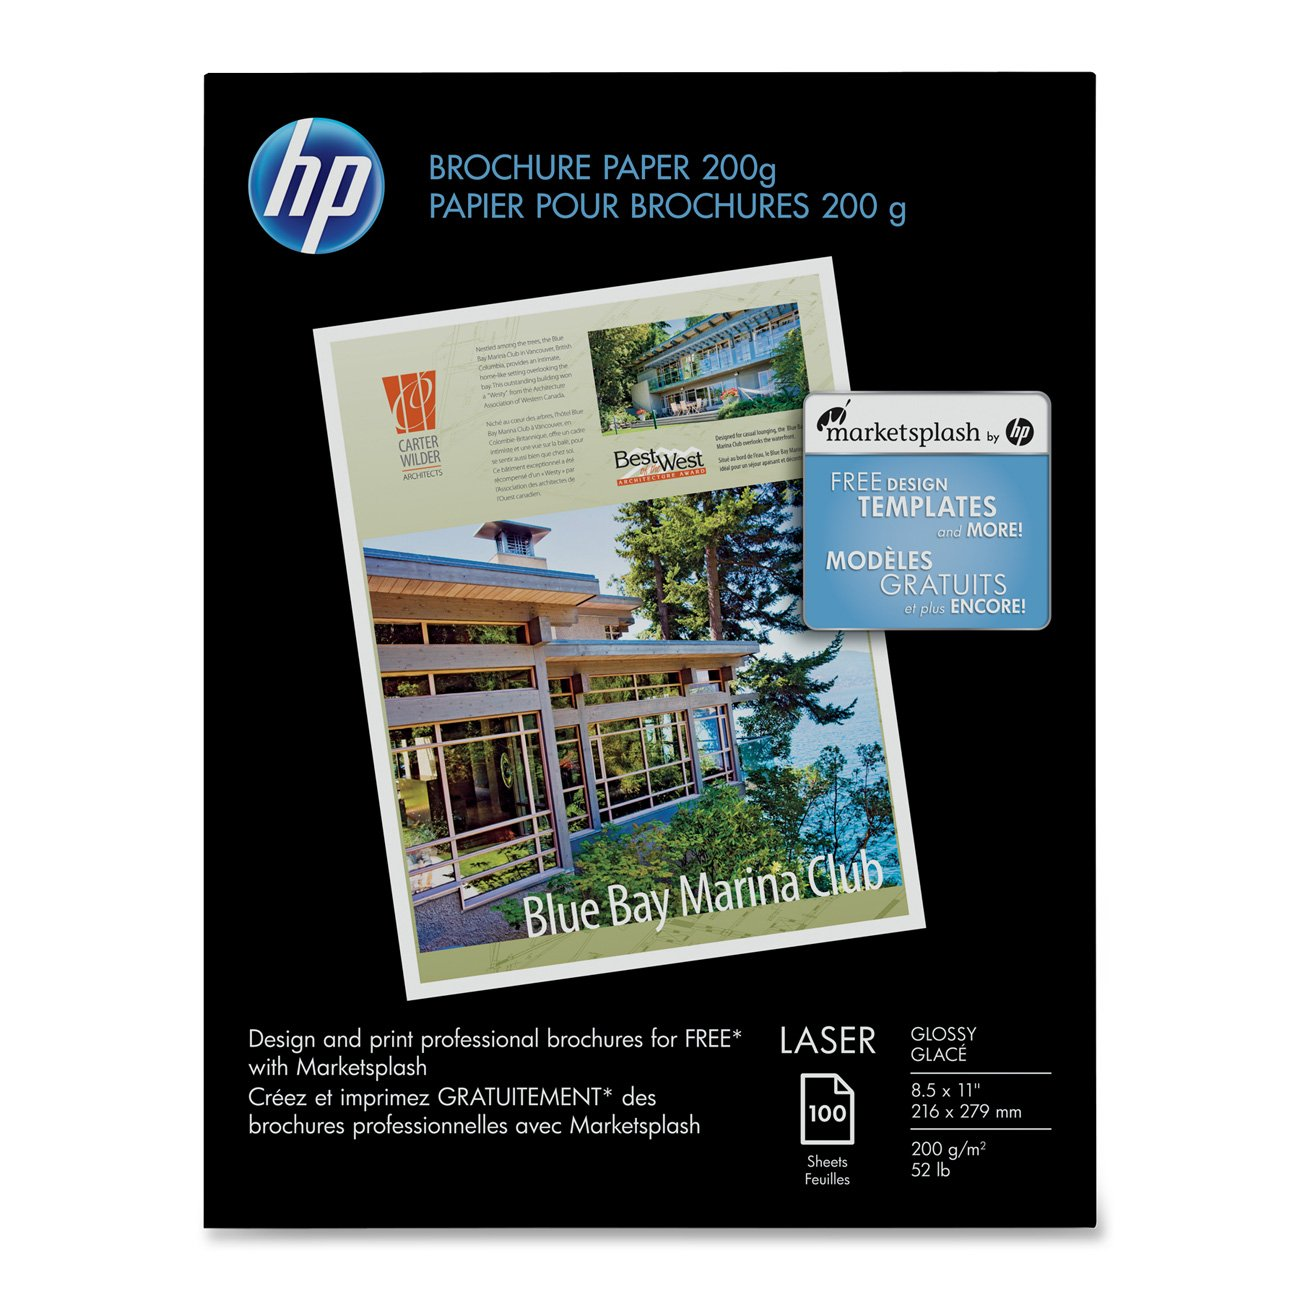 HP Laser Glossy Brochure Paper 100 Sheets 8.5 x 11 inch 200 Gram-Q6608A